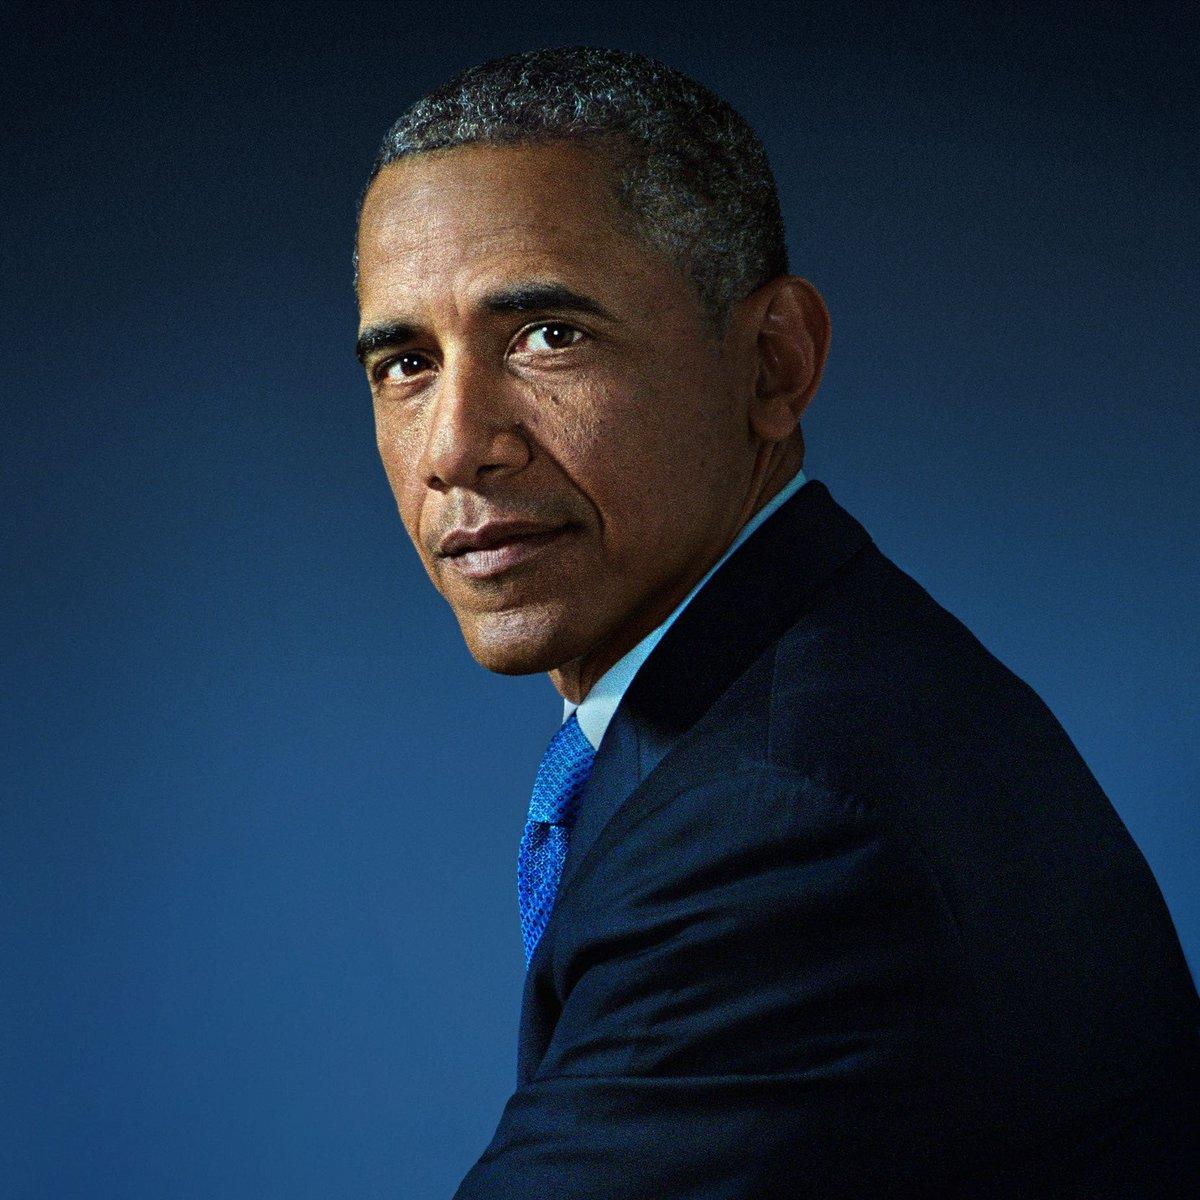 HAPPY BIRTHDAY MR. PRESIDENT! WE MISS HAVING A REAL PRESIDENT IN THE WHITE HOUSE! @BarackObama #HappyBirthdayObama #TuesdayThoughts #KidVicious🎂